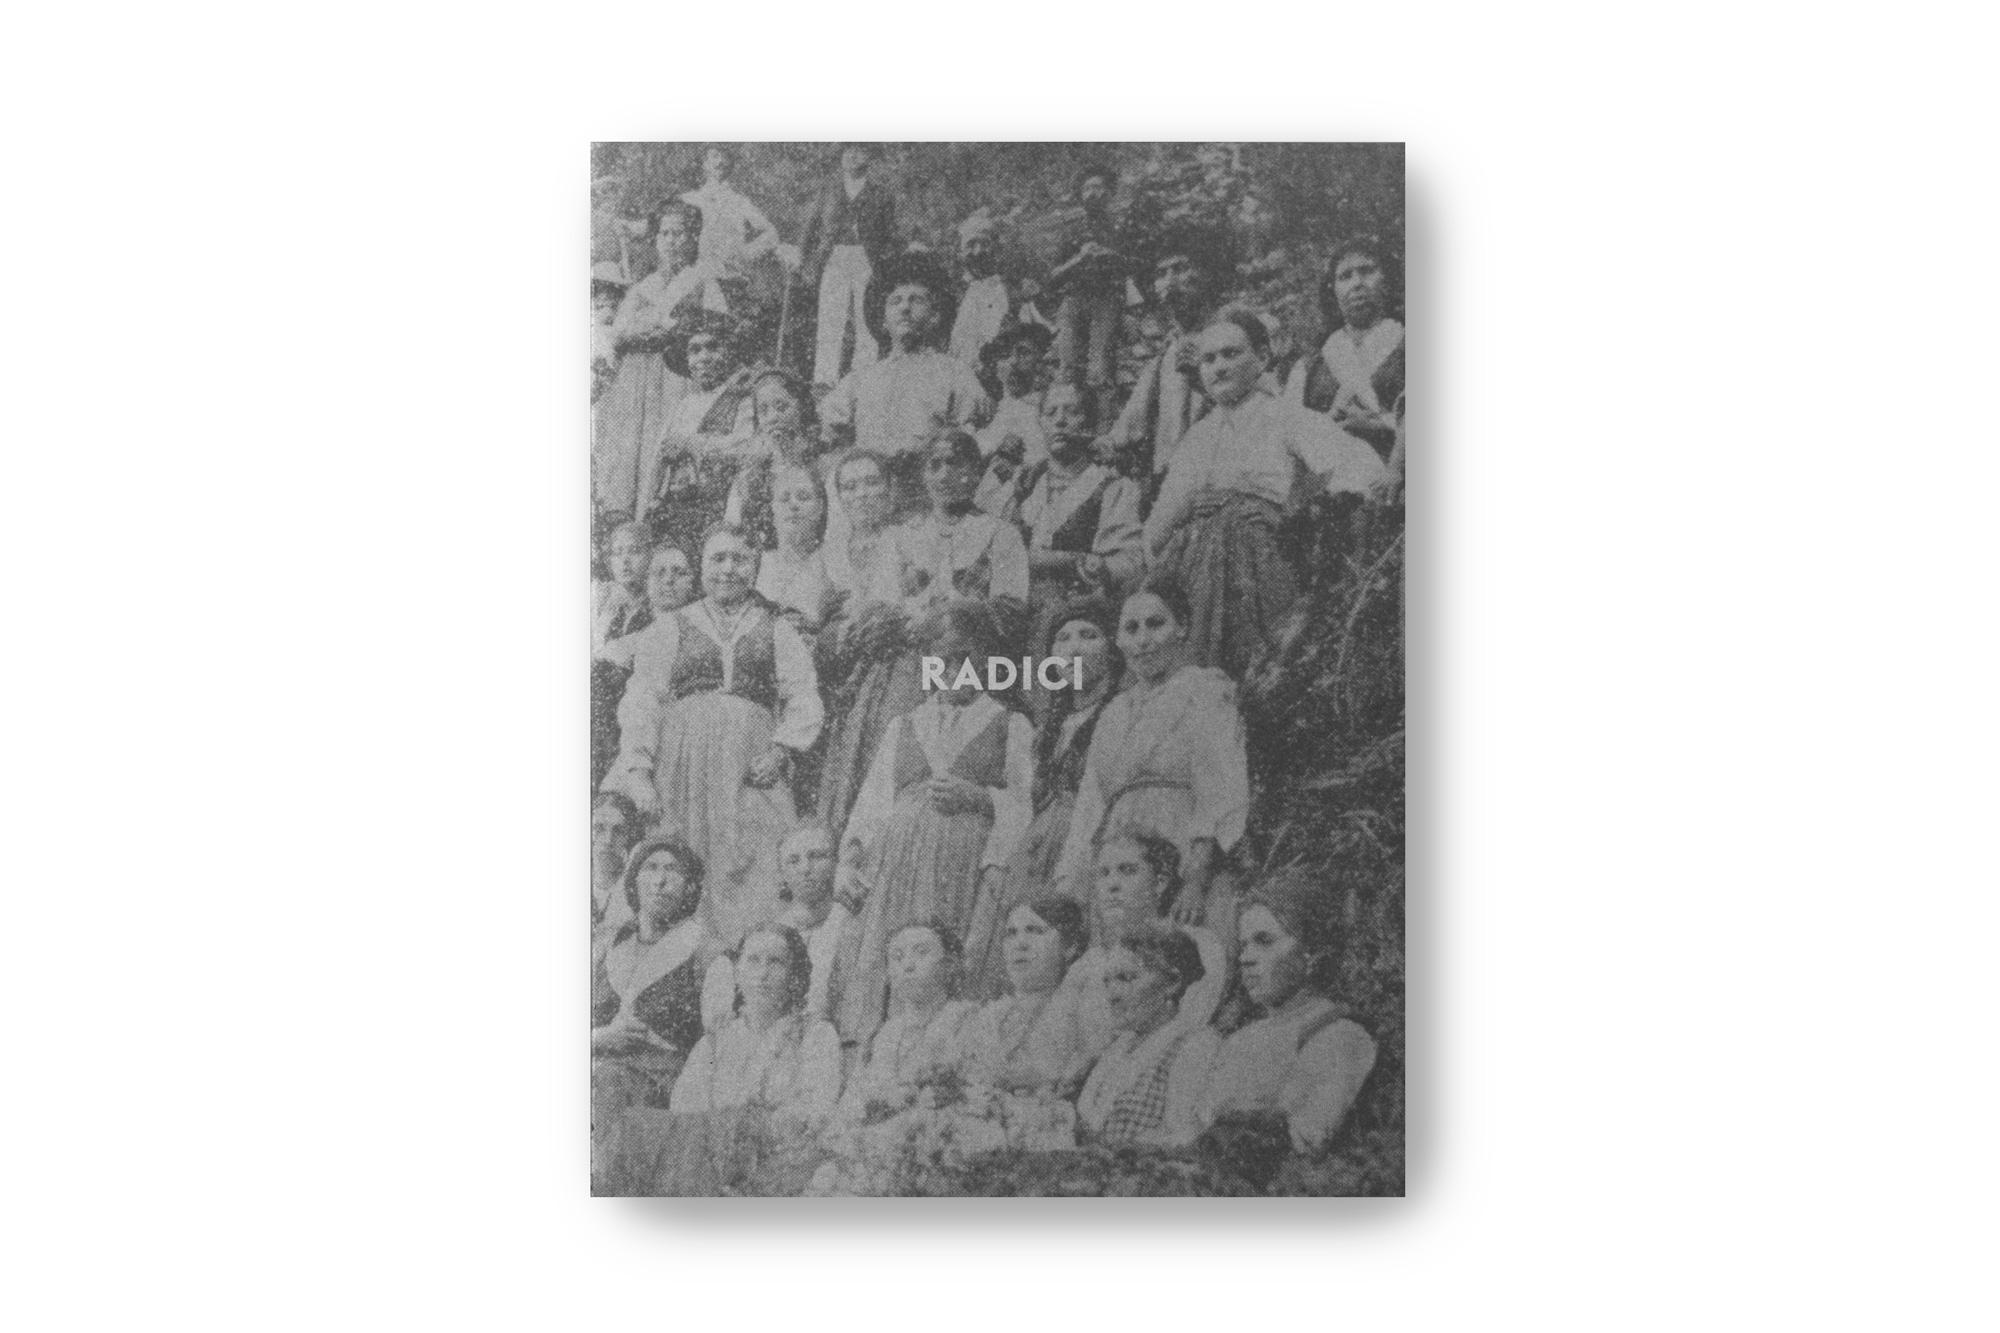 radici_01.jpg